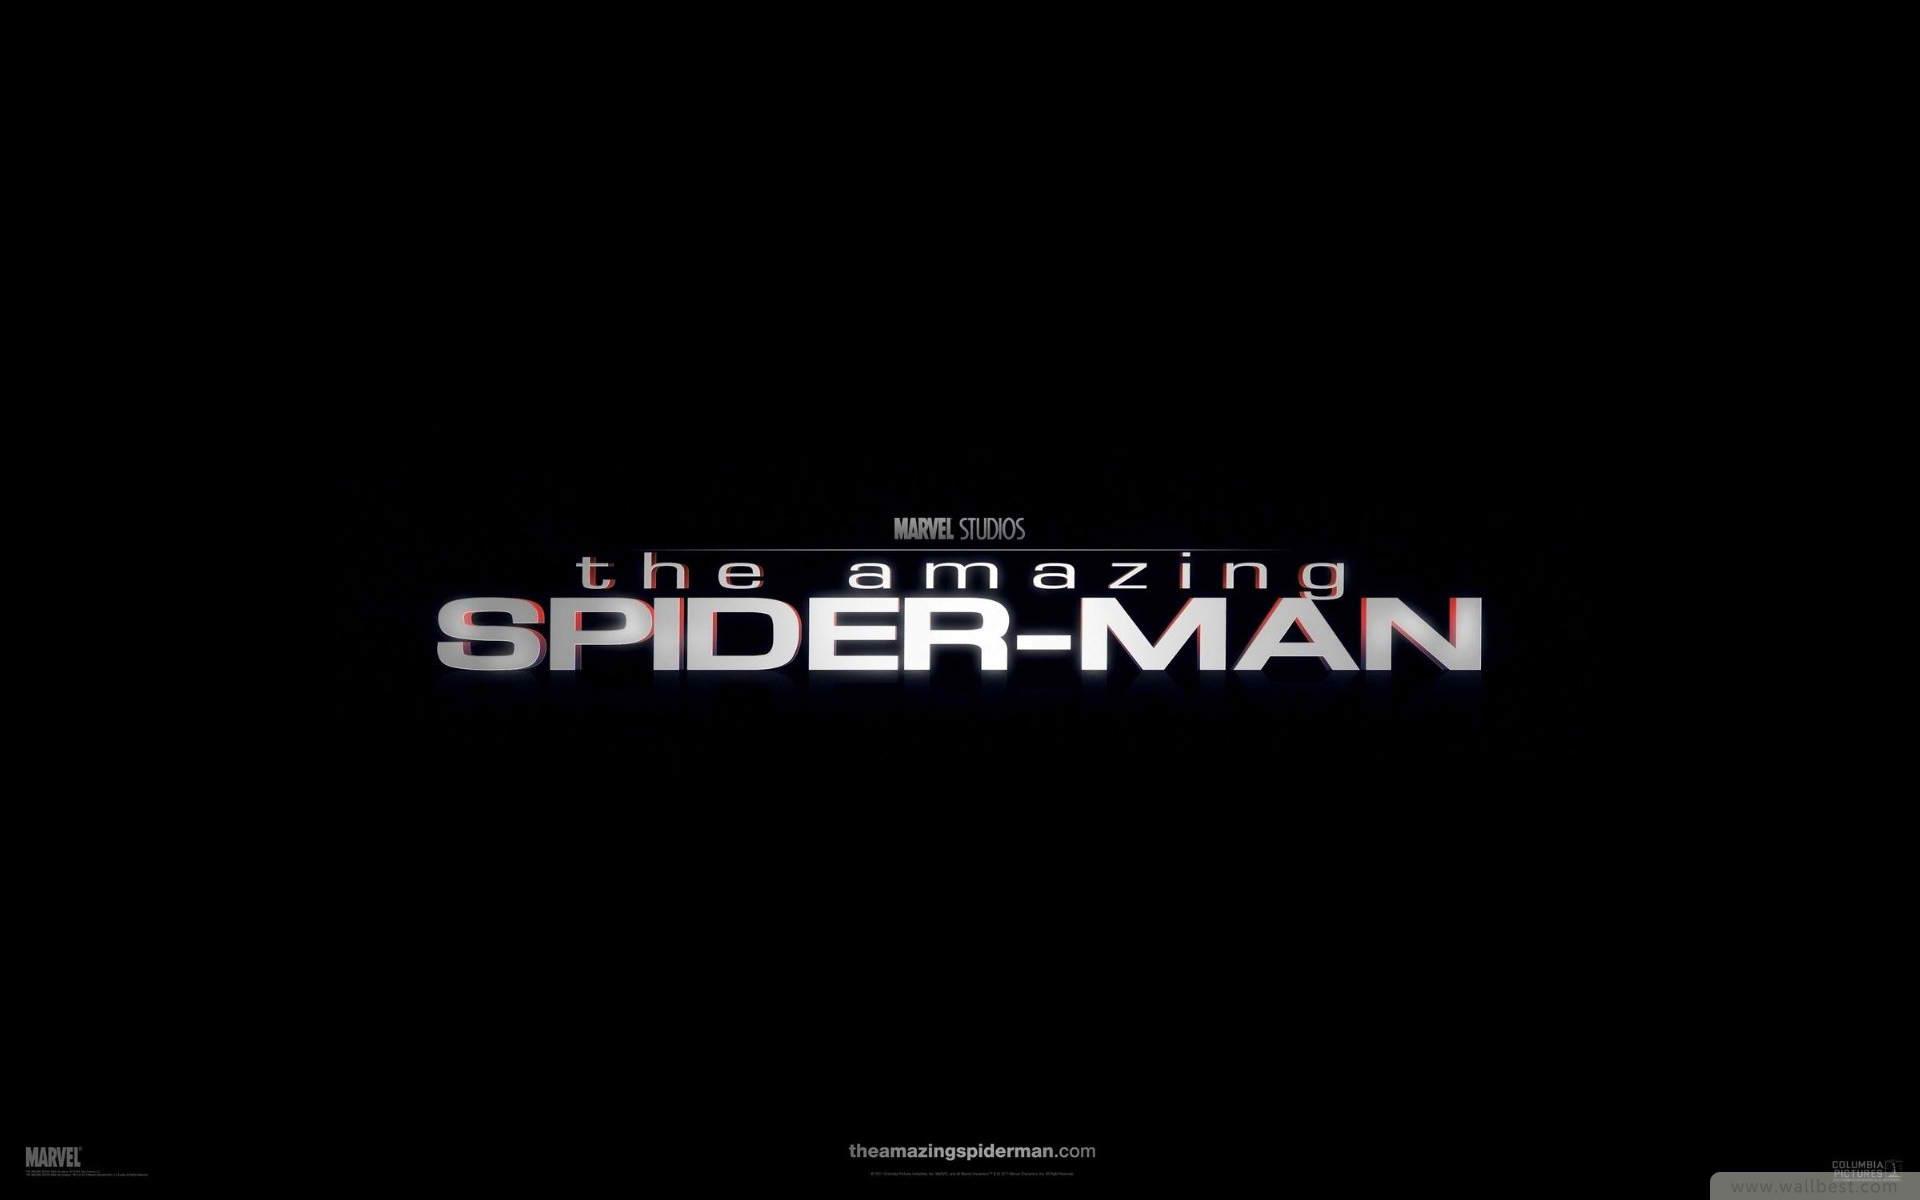 the-amazing-spider-man-2012-movie-logo